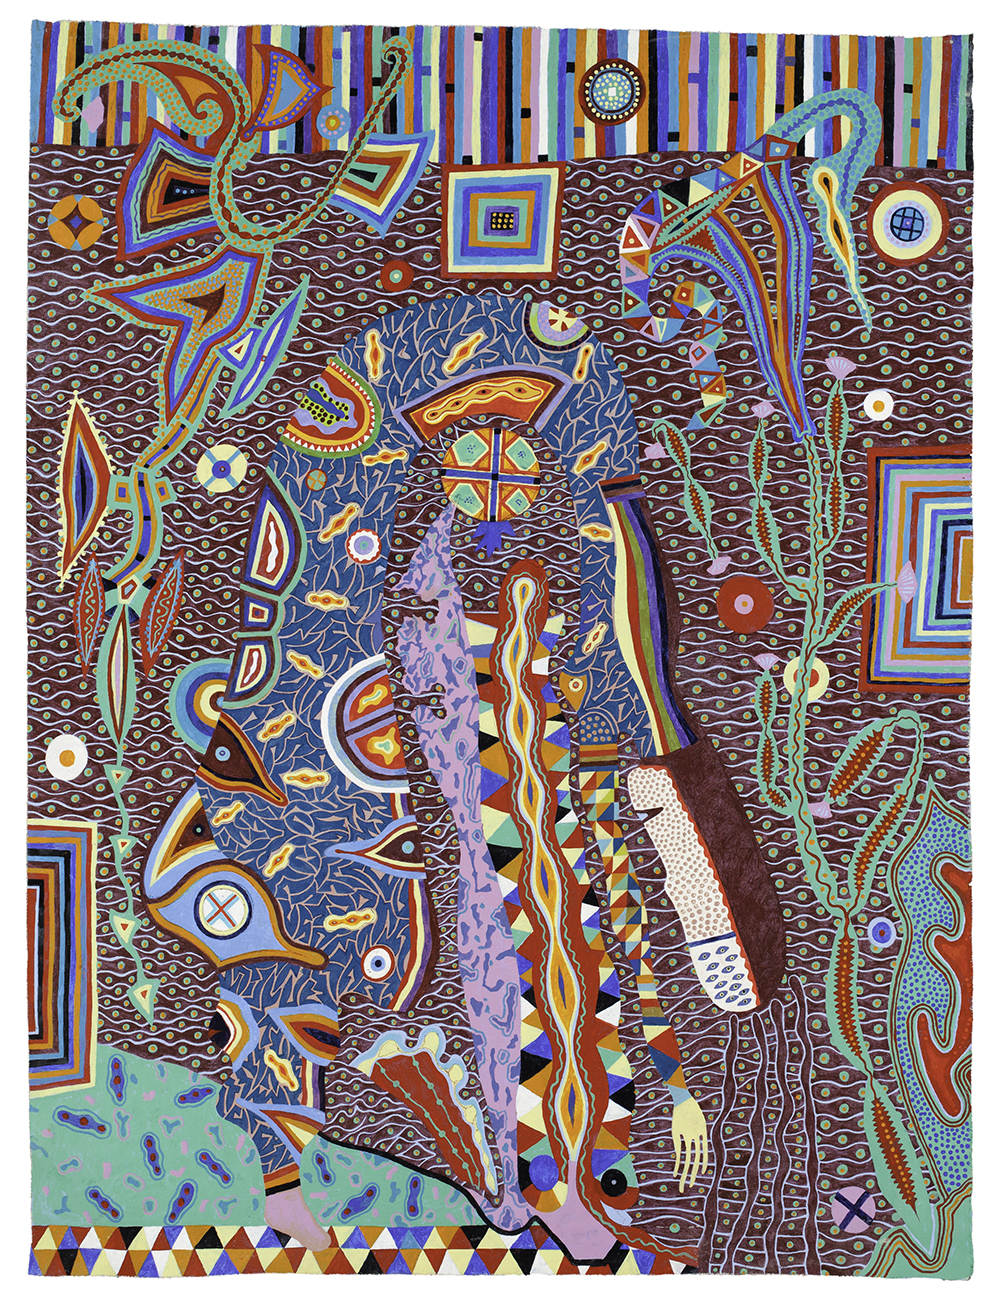 Upside Down, 2012, Patrick Maloney, Acrylic On Canvas, 53x41